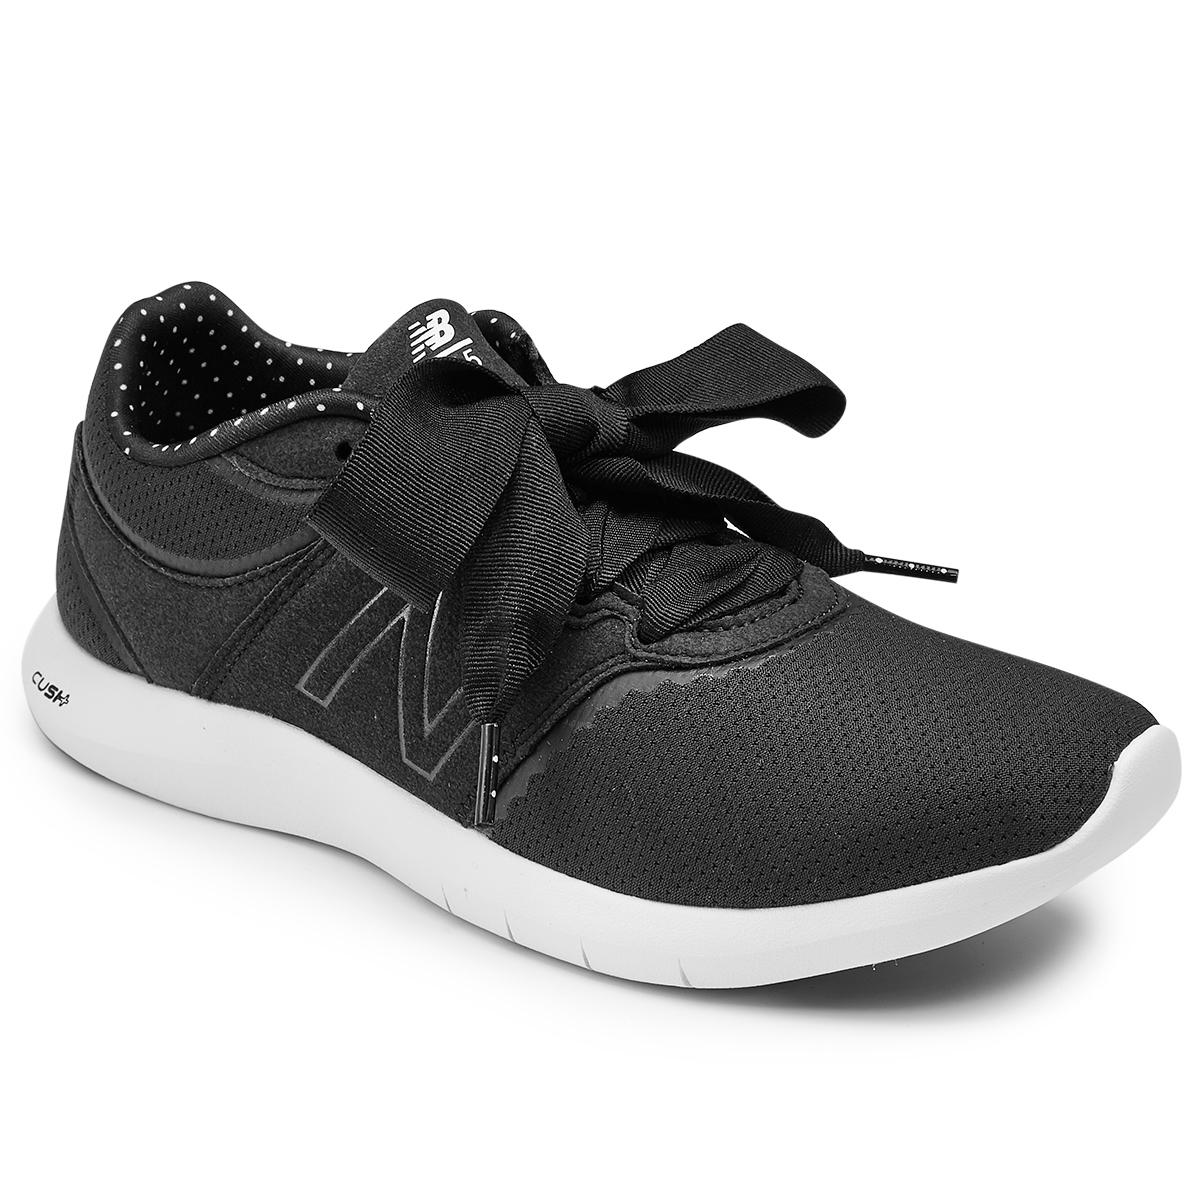 New Balance Women's 415 V1 Cross-Training Shoes - Black, 9.5